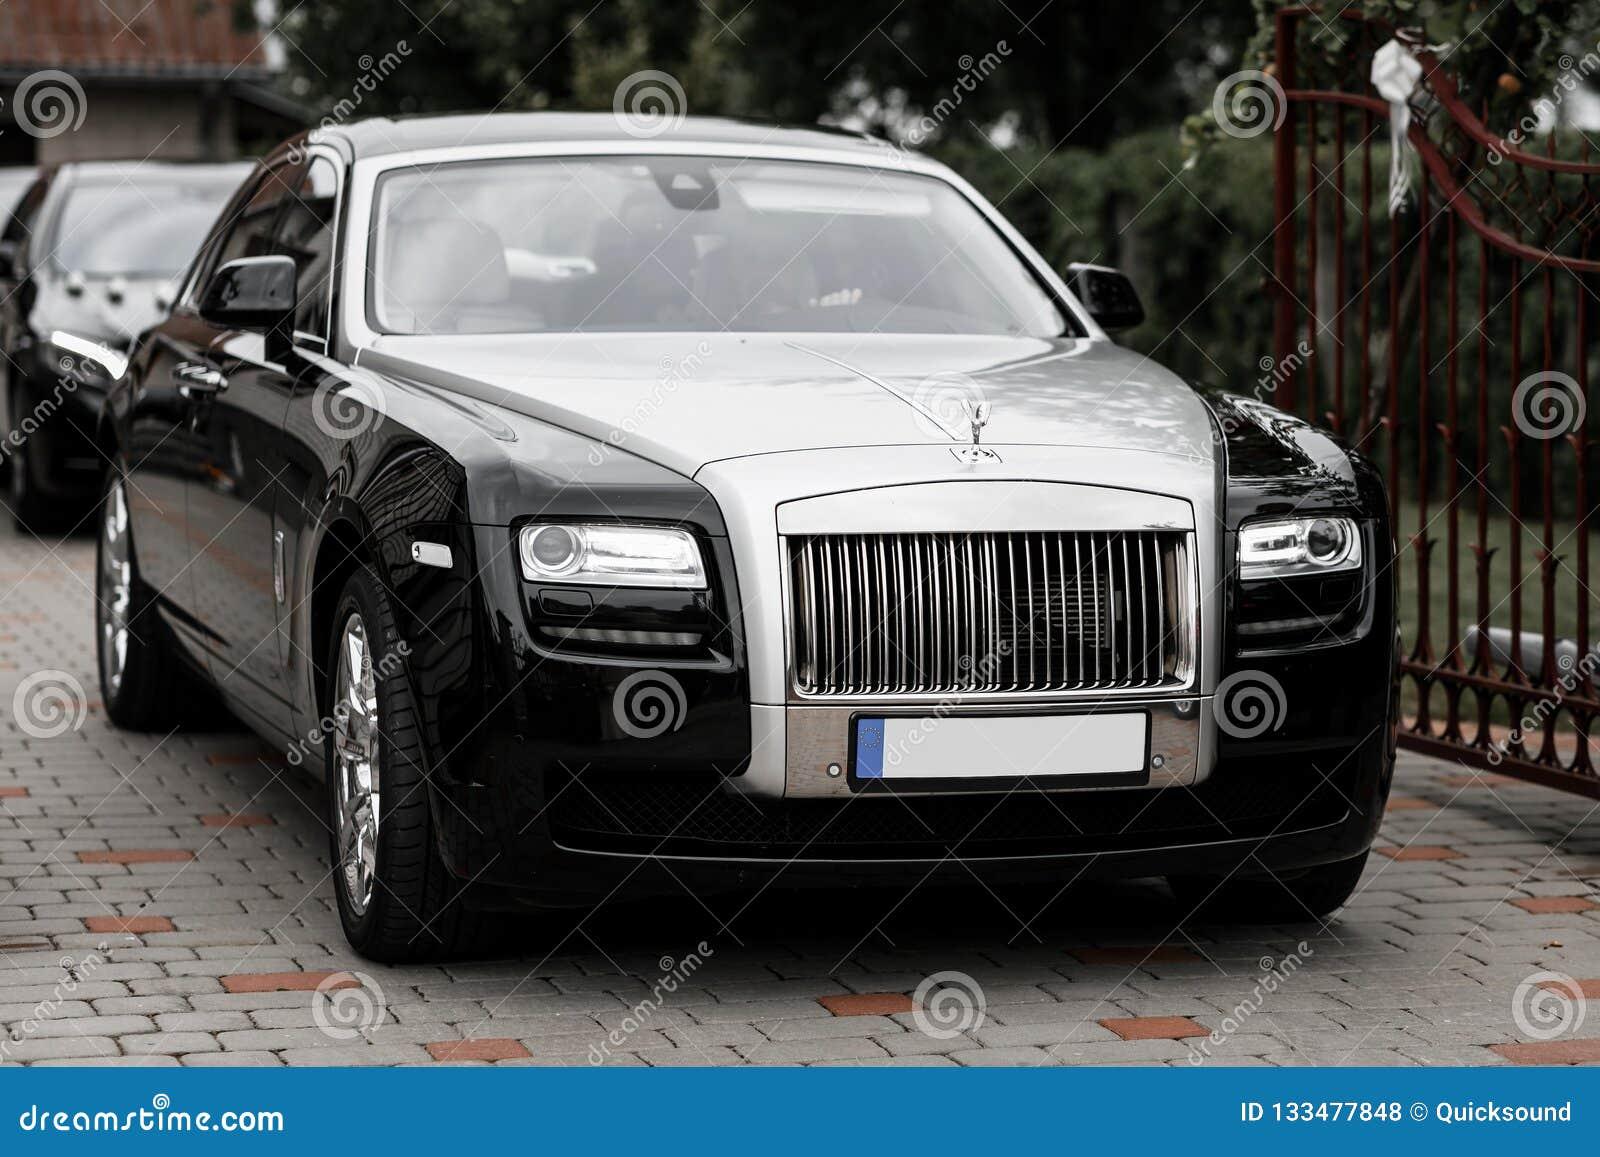 Rolls Royce Car Editorial Stock Photo Image Of Comfort 133477848